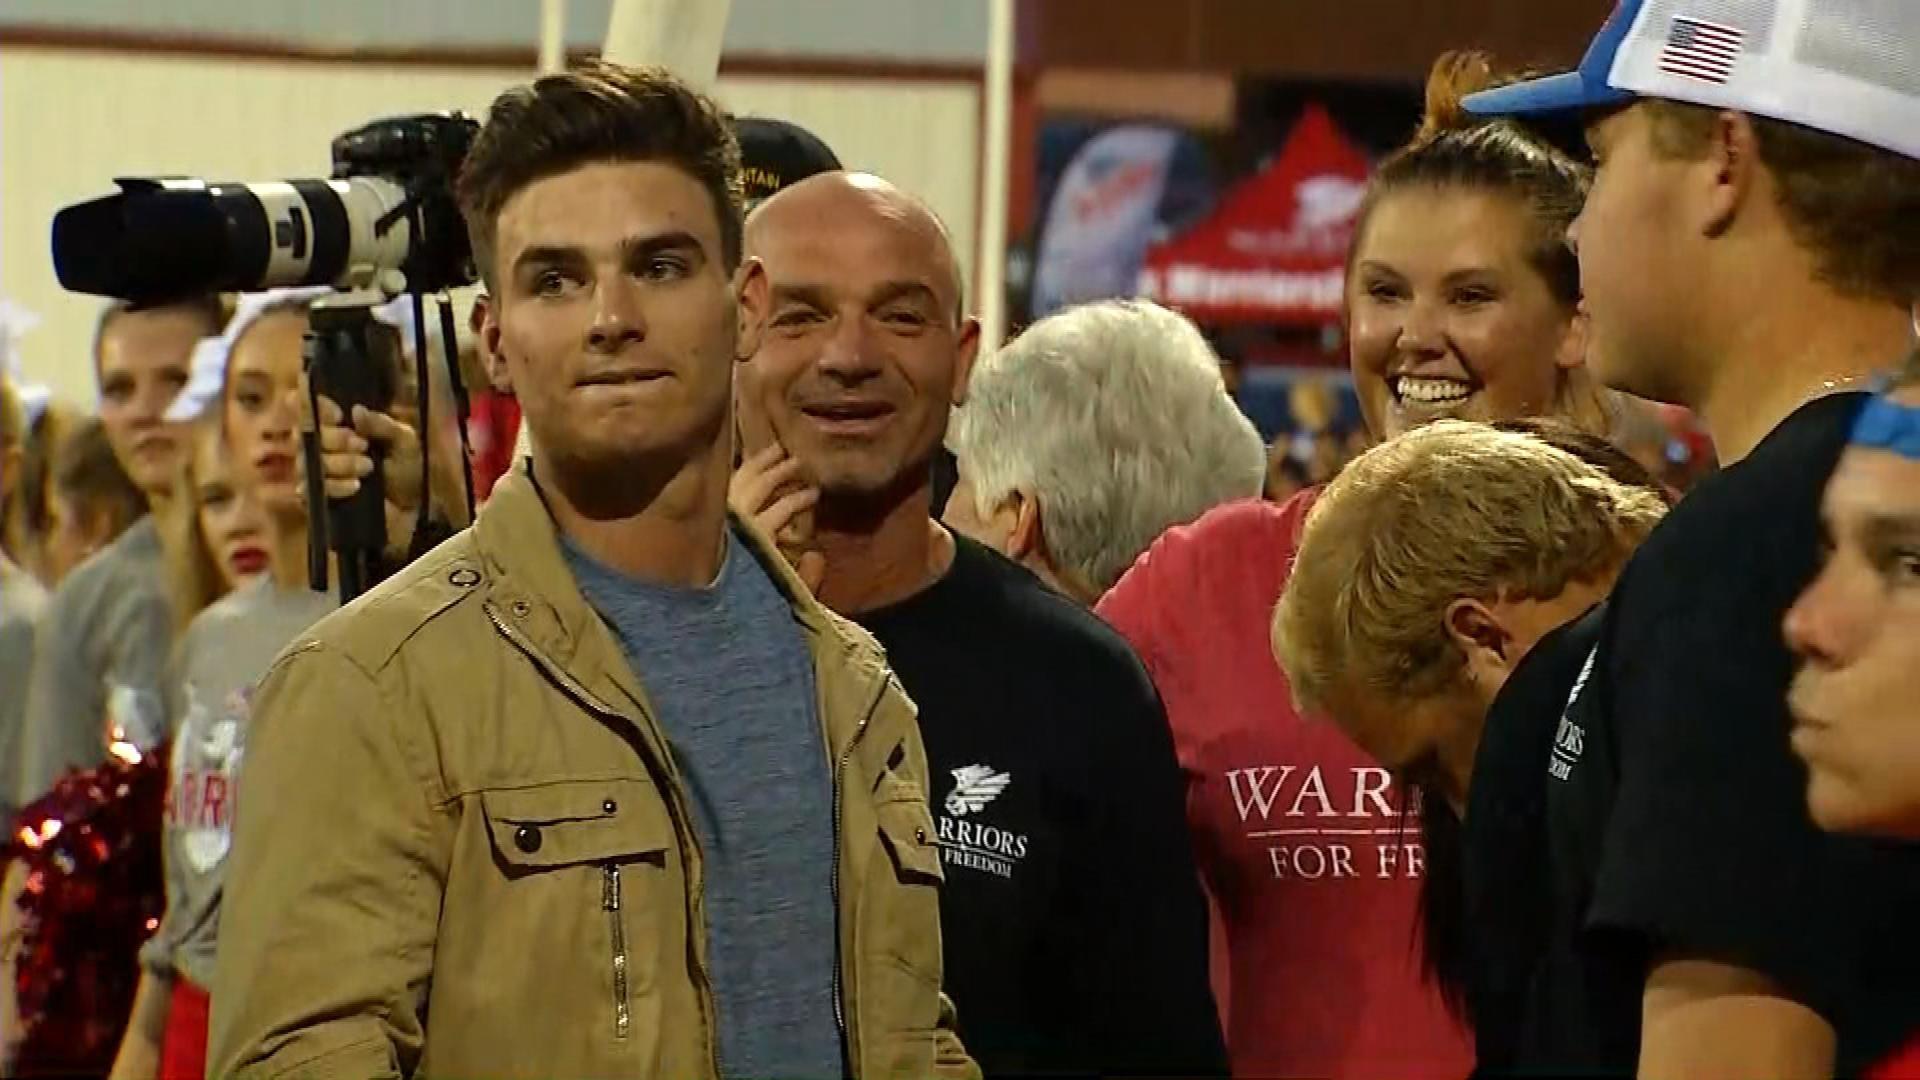 Soldier Makes Surprise Return To Family At Washington Football Game